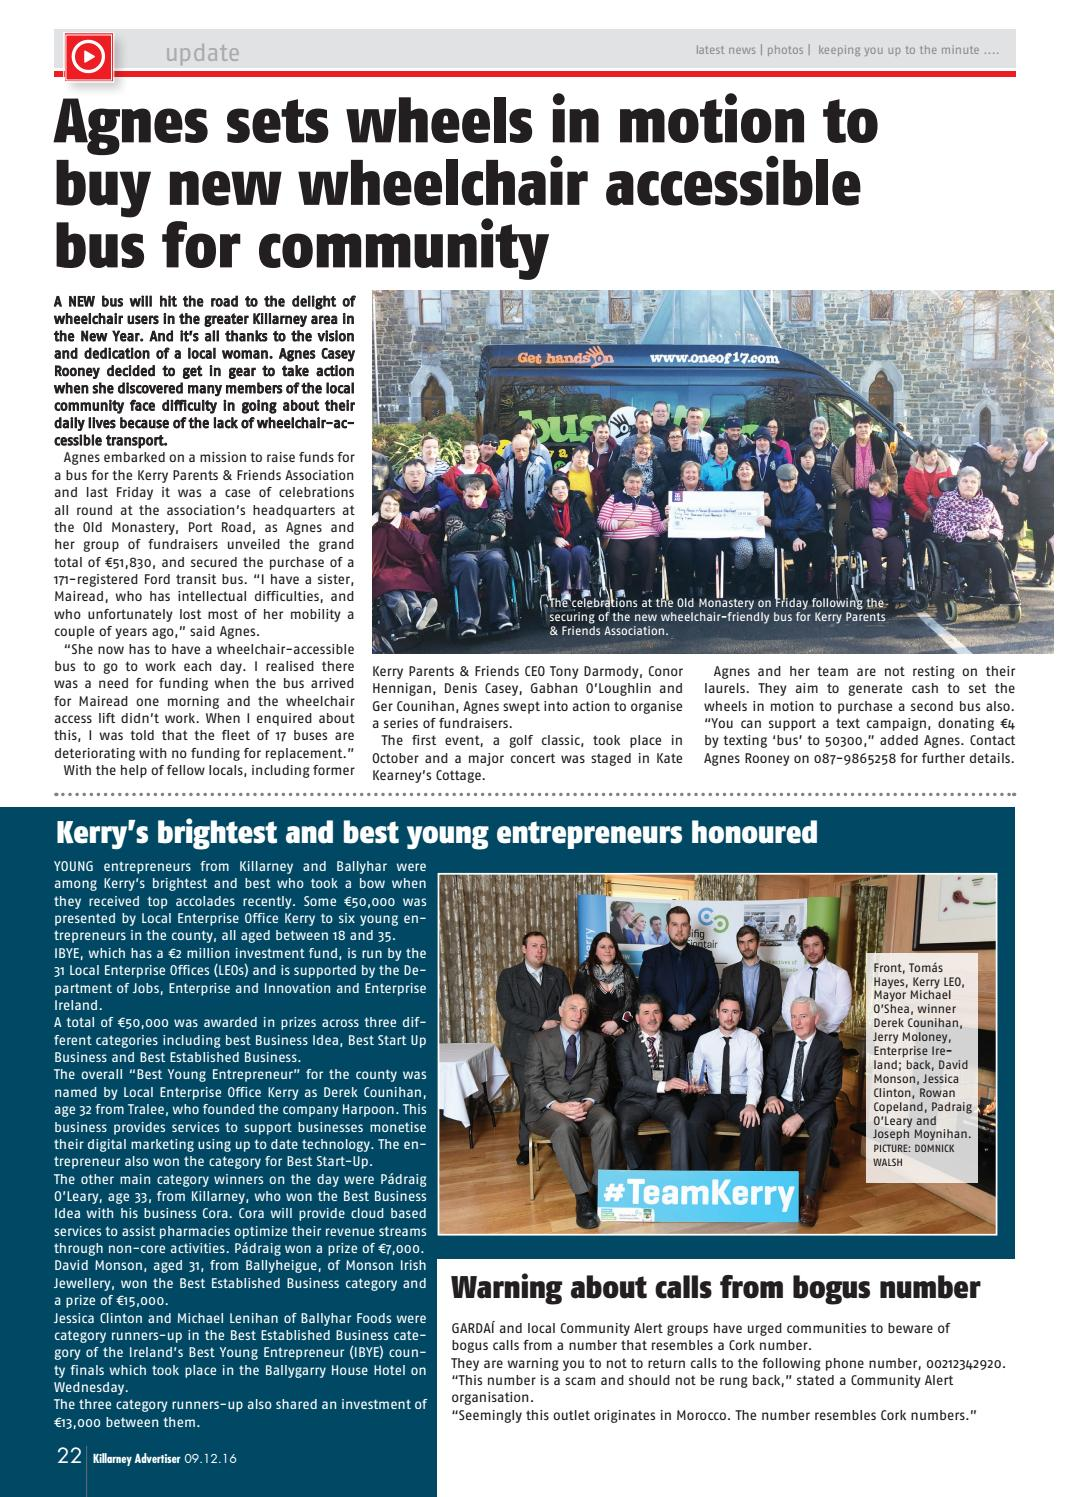 Killarney Advertiser, December 9th, 2016 by Killarney Advertiser - issuu